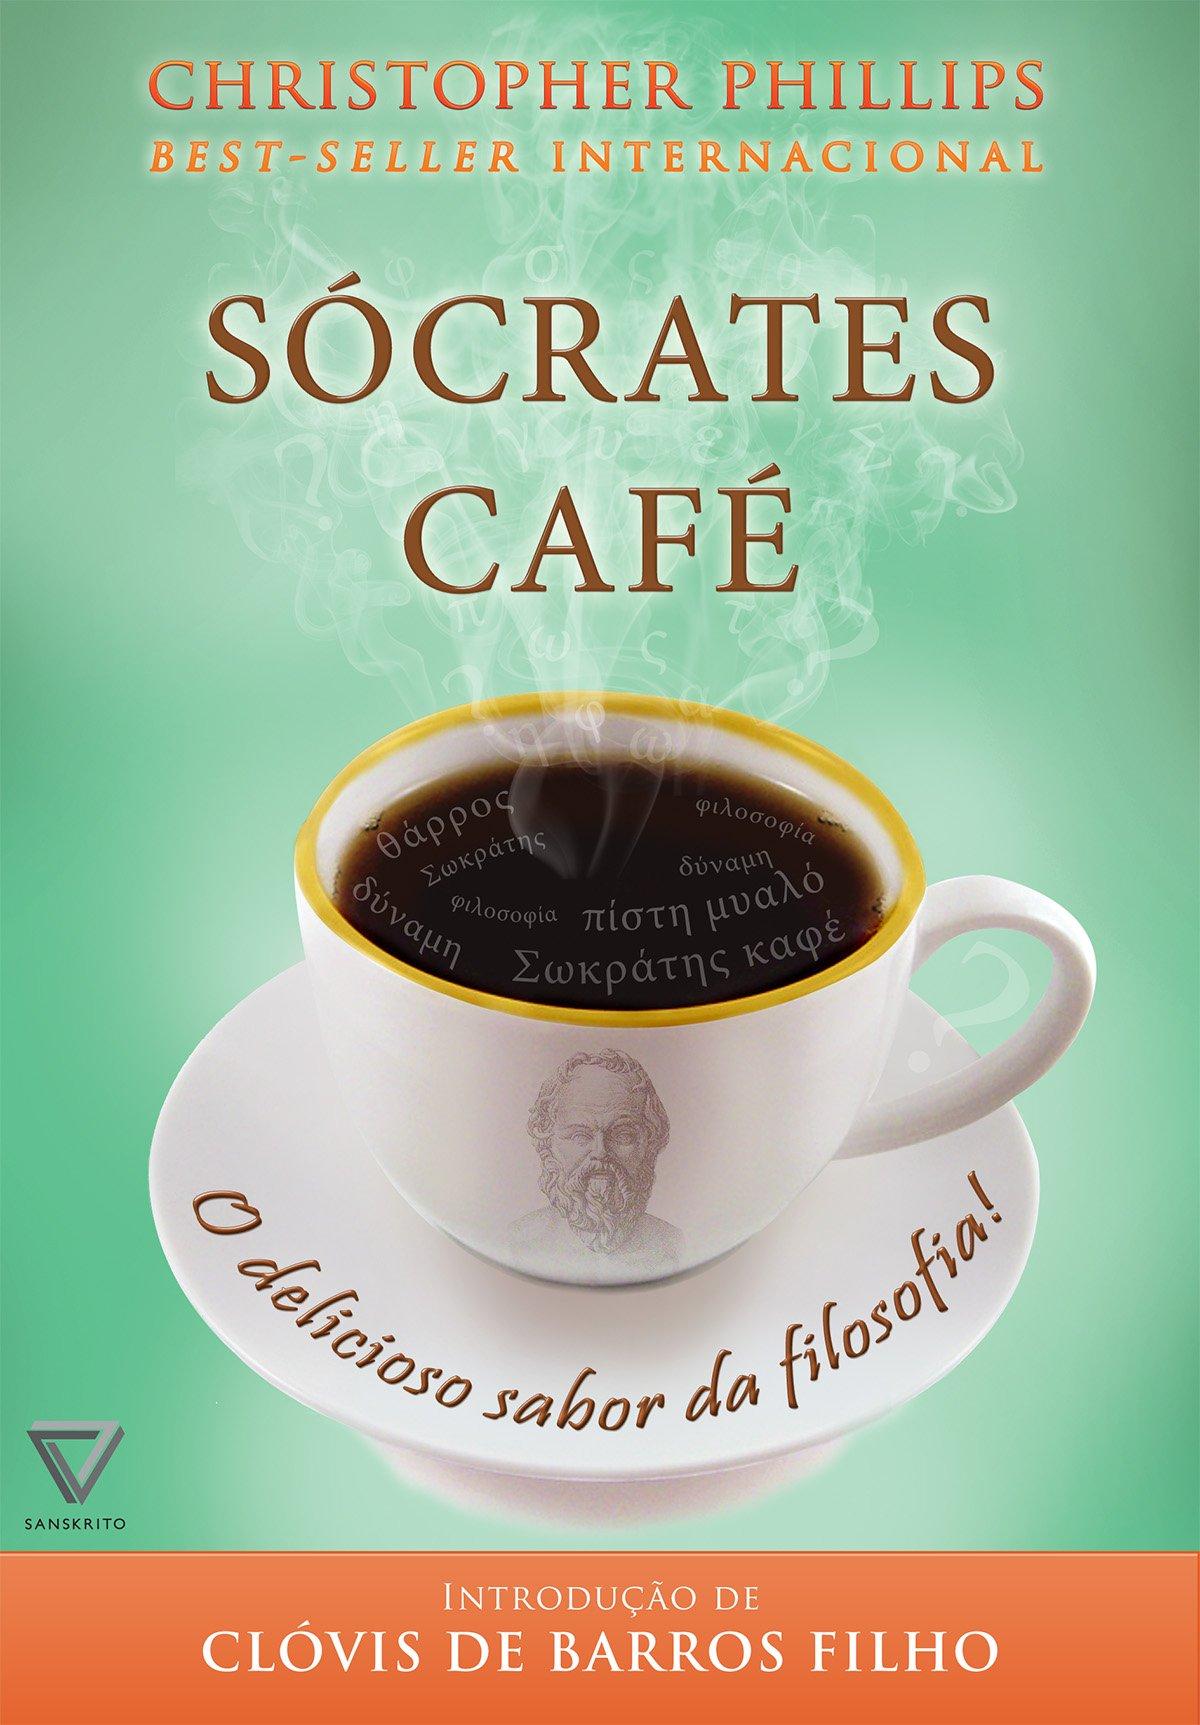 Sócrates café: O delicioso sabor da filosofia | Amazon.com.br